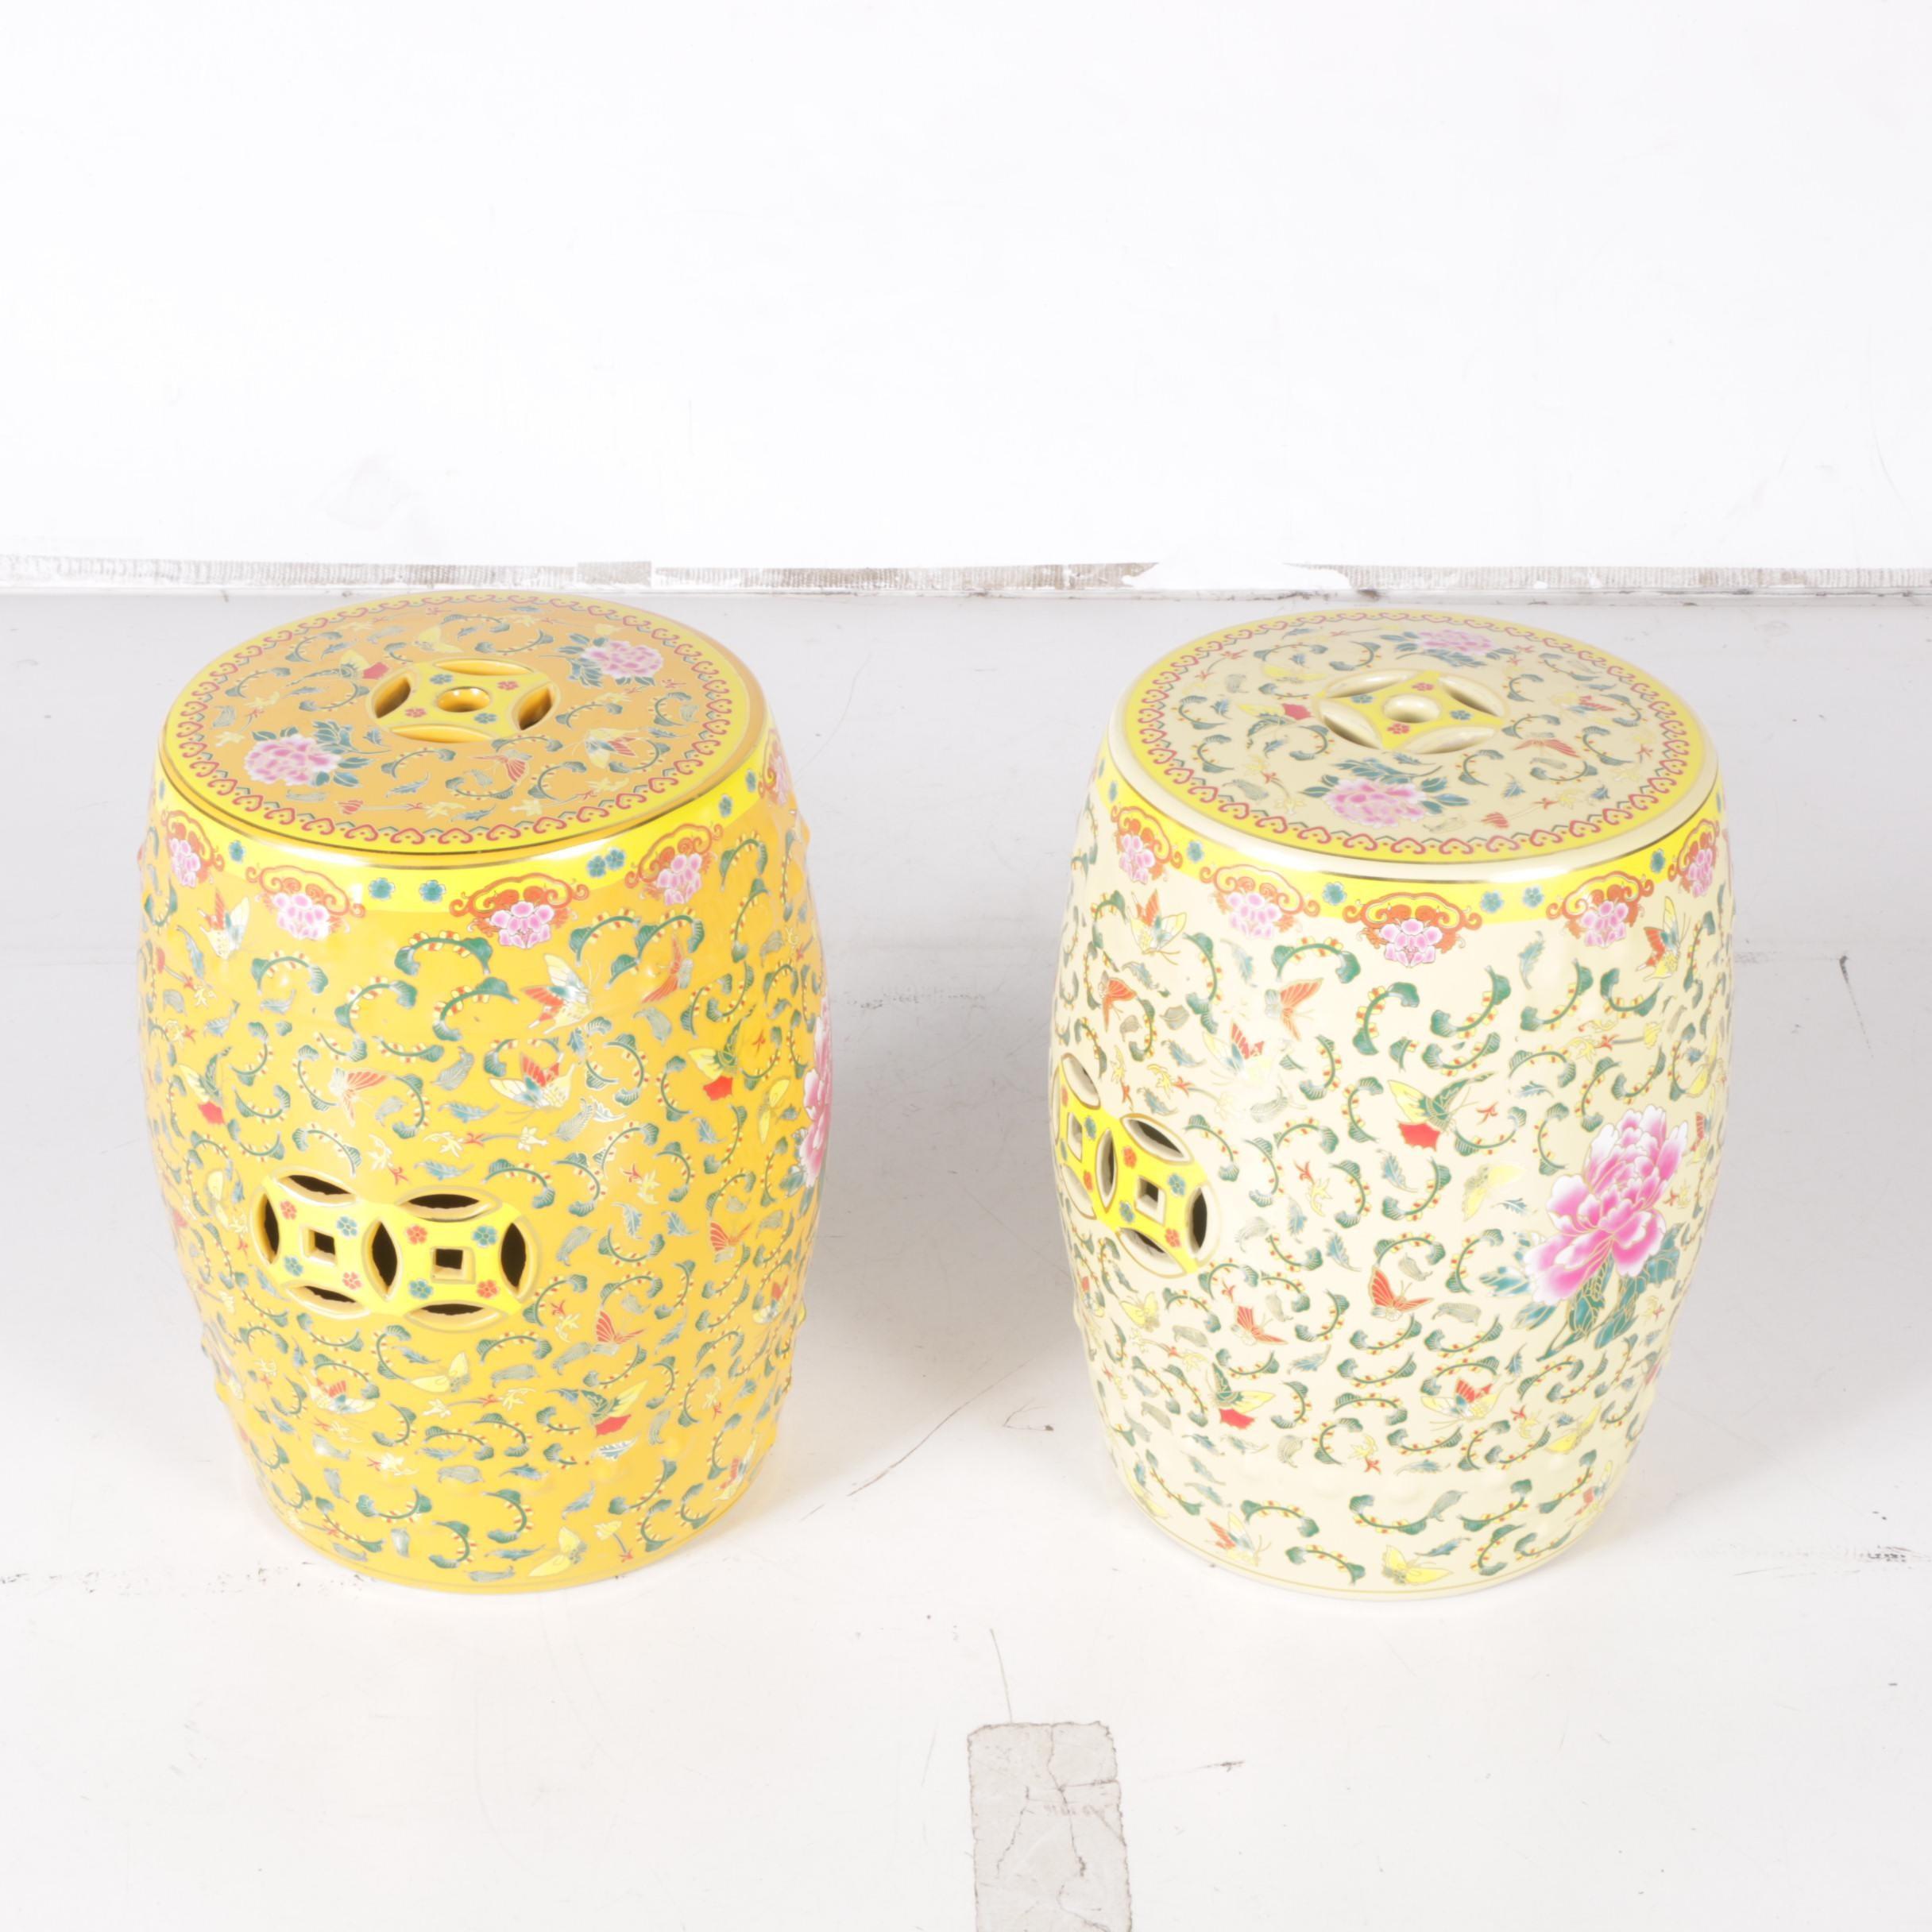 Pair of Chinese Decorative Ceramic Garden Stools